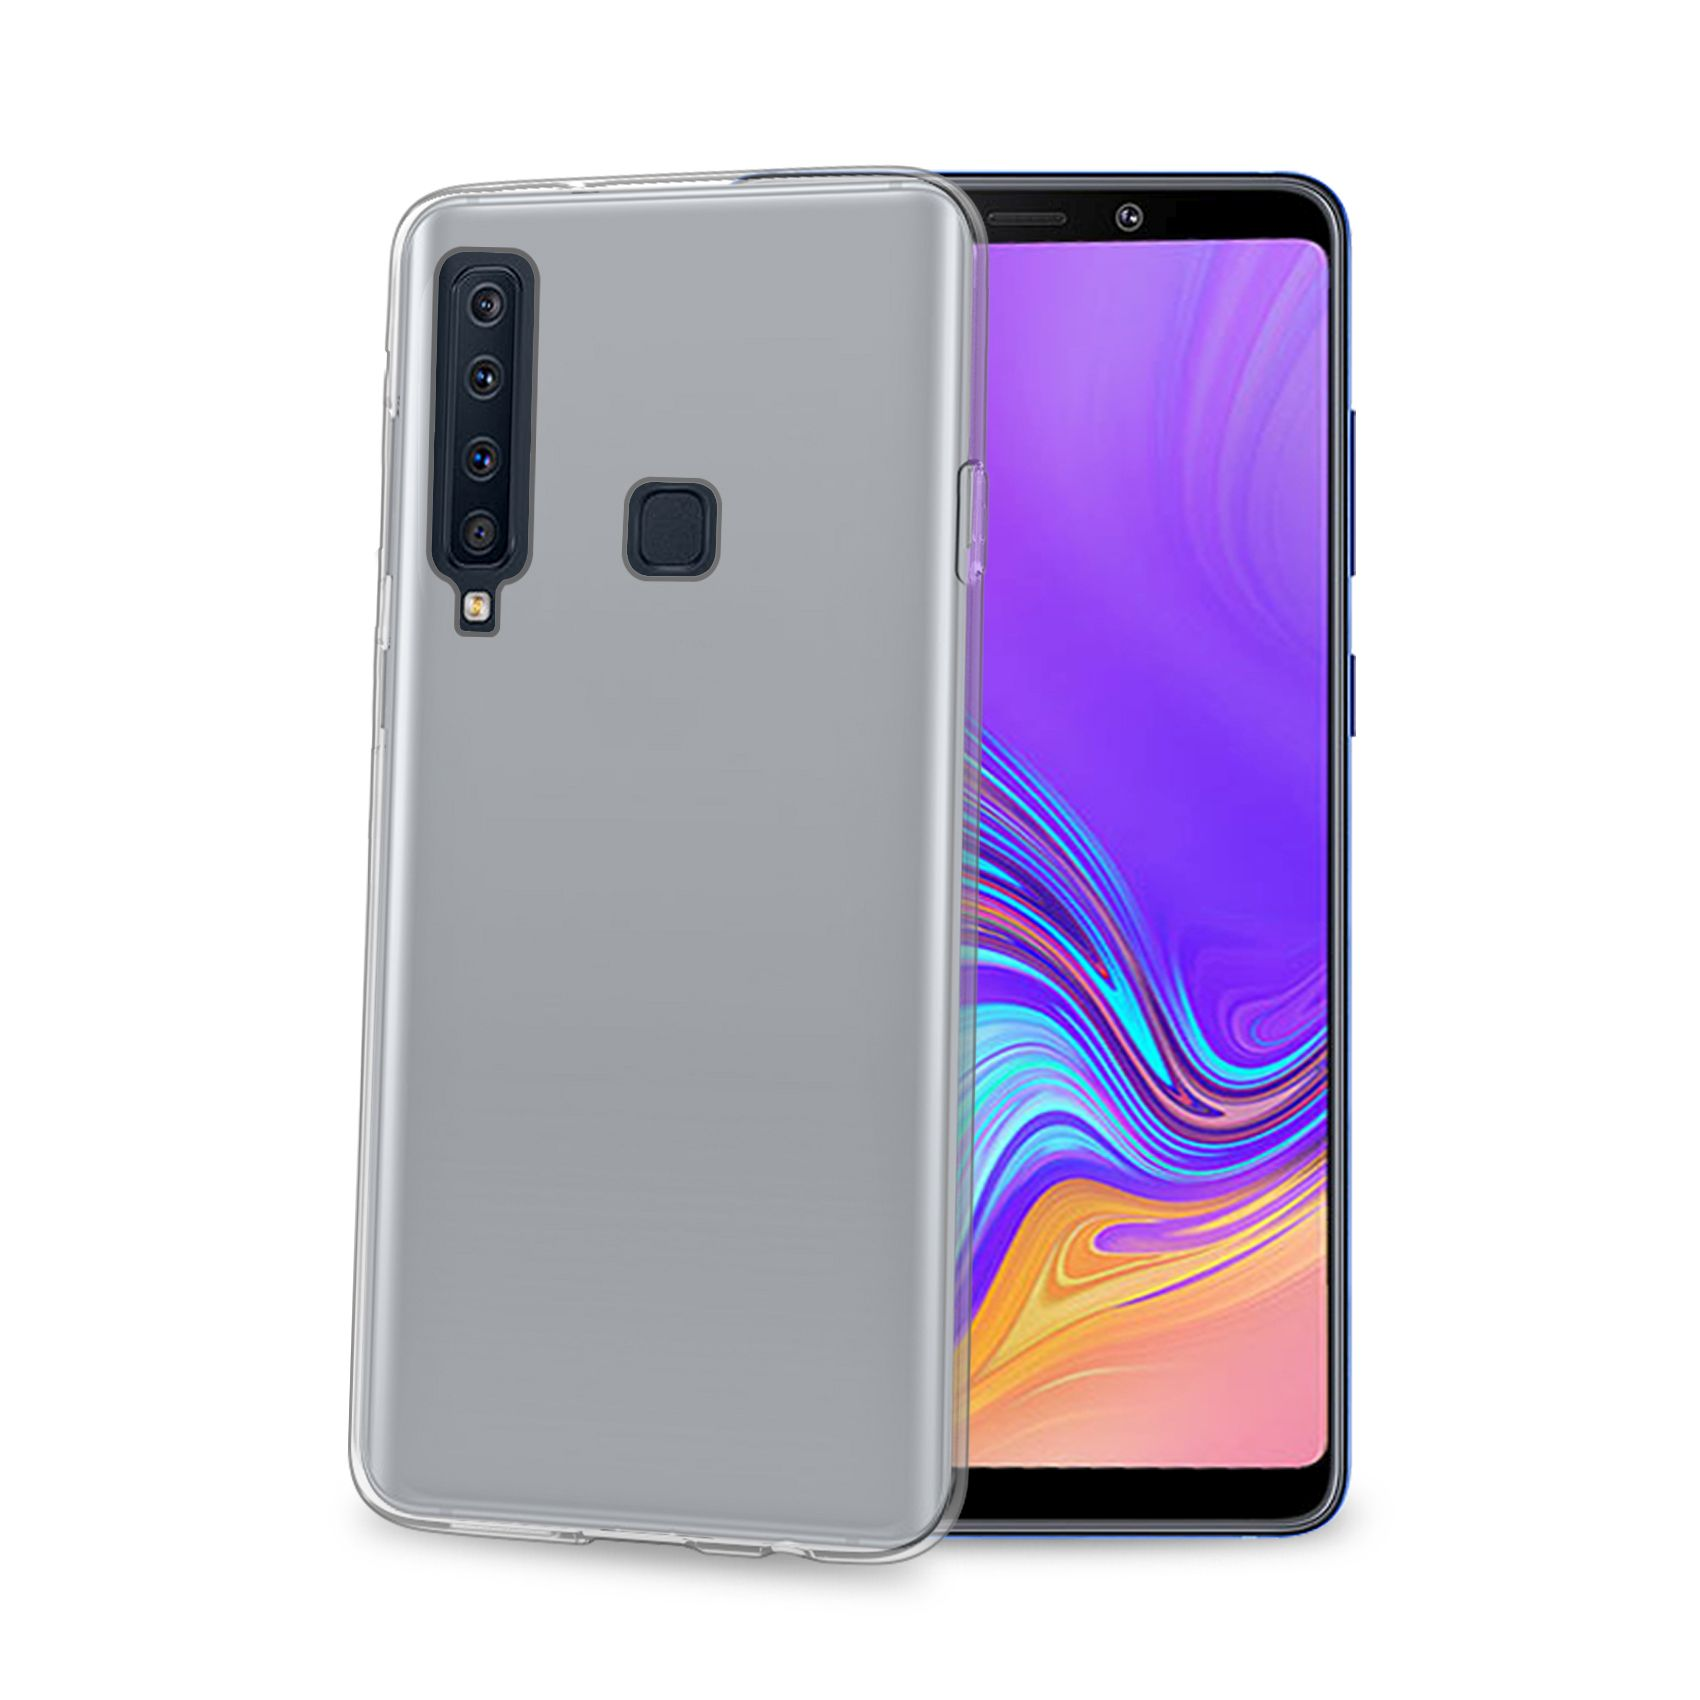 TPU pouzdro CELLY Gelskin pro Samsung Galaxy A9 (2018), bezbarvé